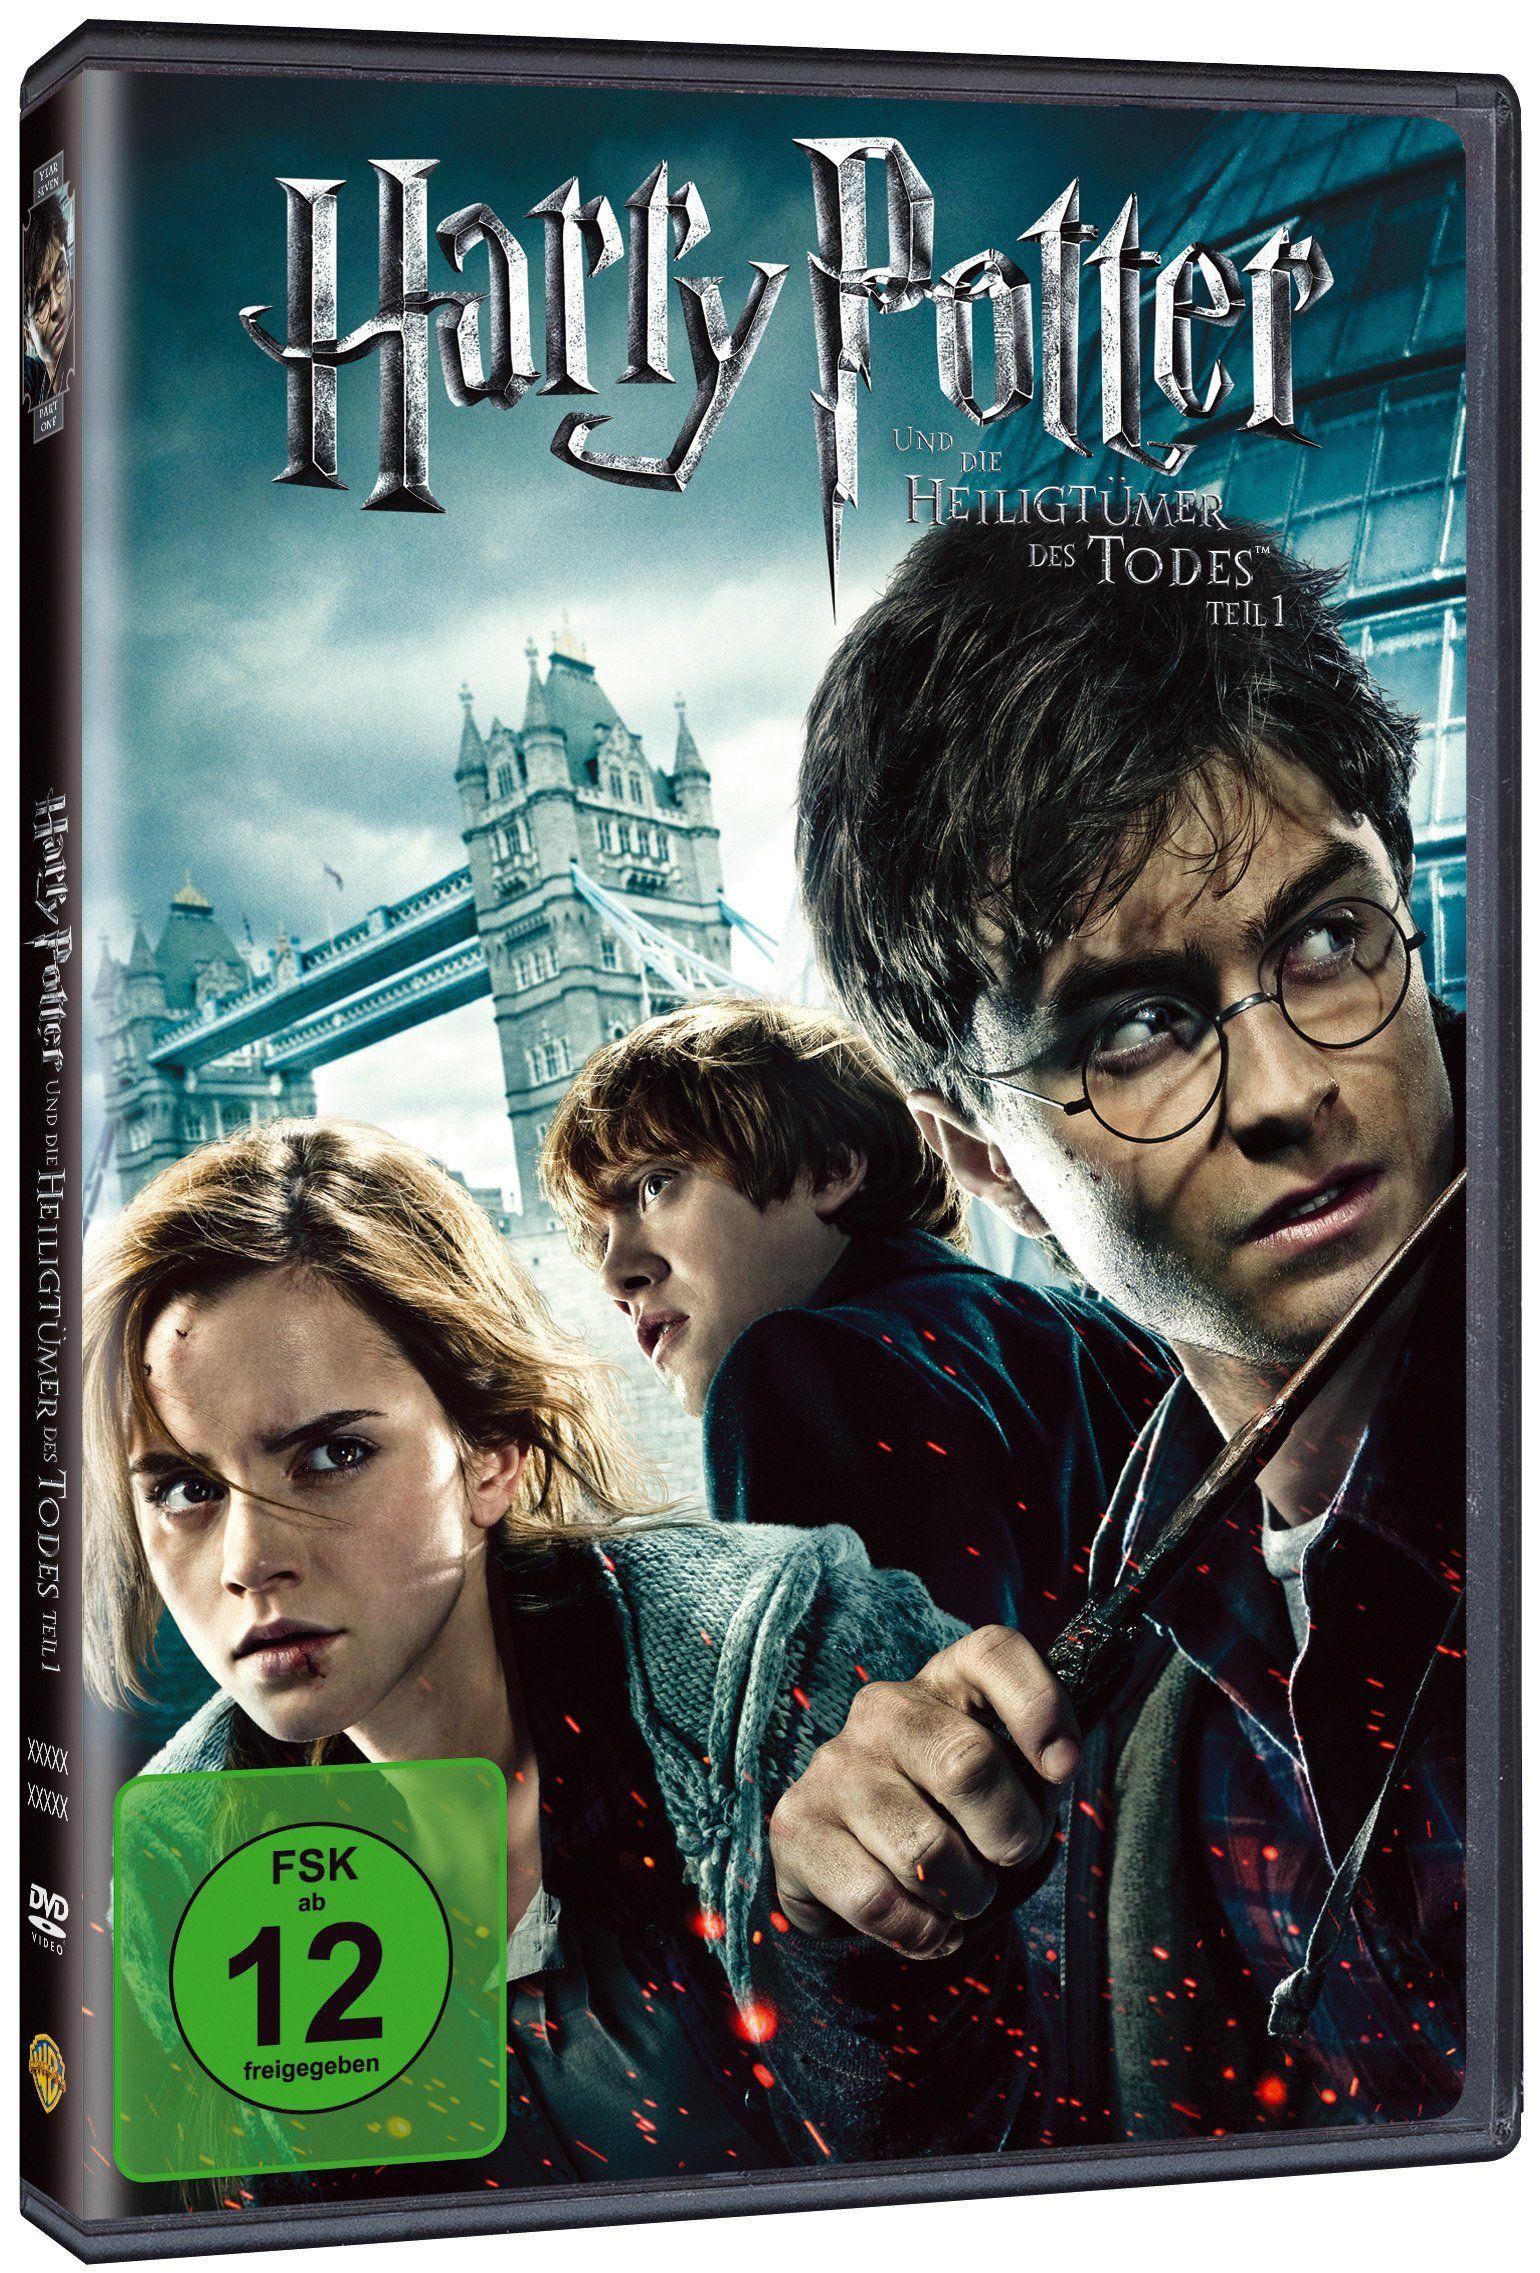 Pin De Eratex En Harry Poter Harry Potter Alemania Dvd